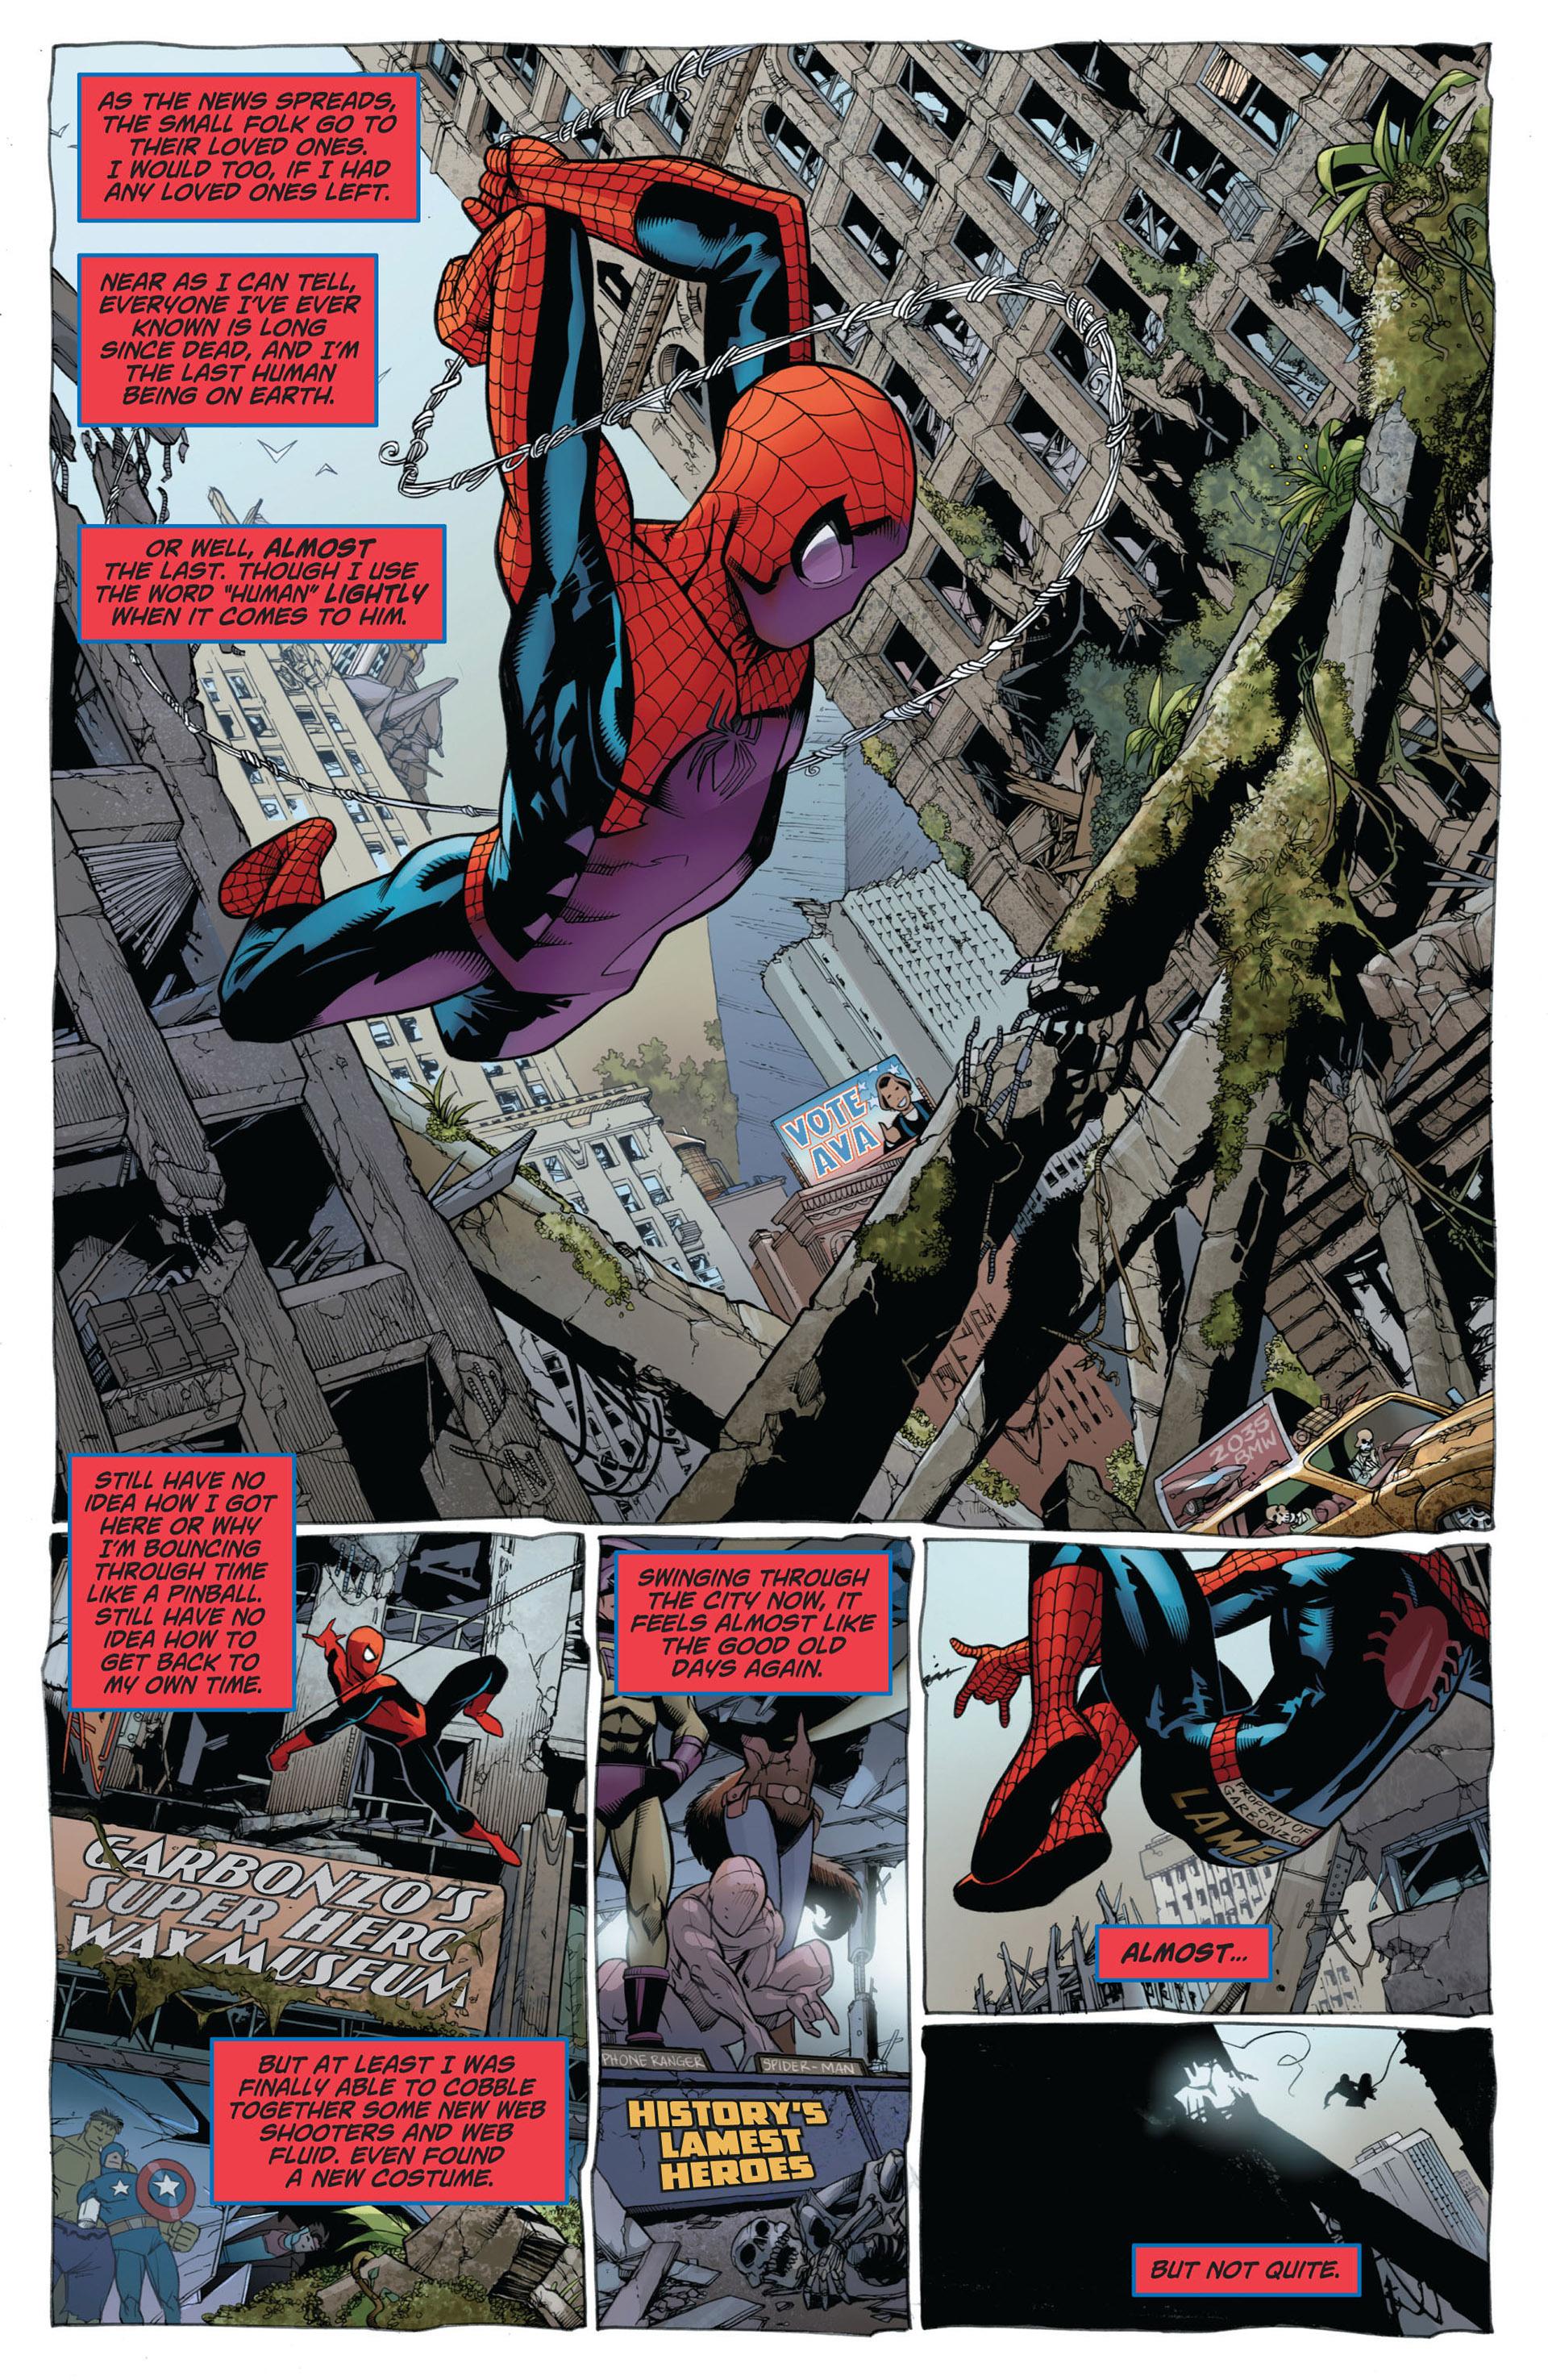 Read online Astonishing Spider-Man & Wolverine comic -  Issue #2 - 6